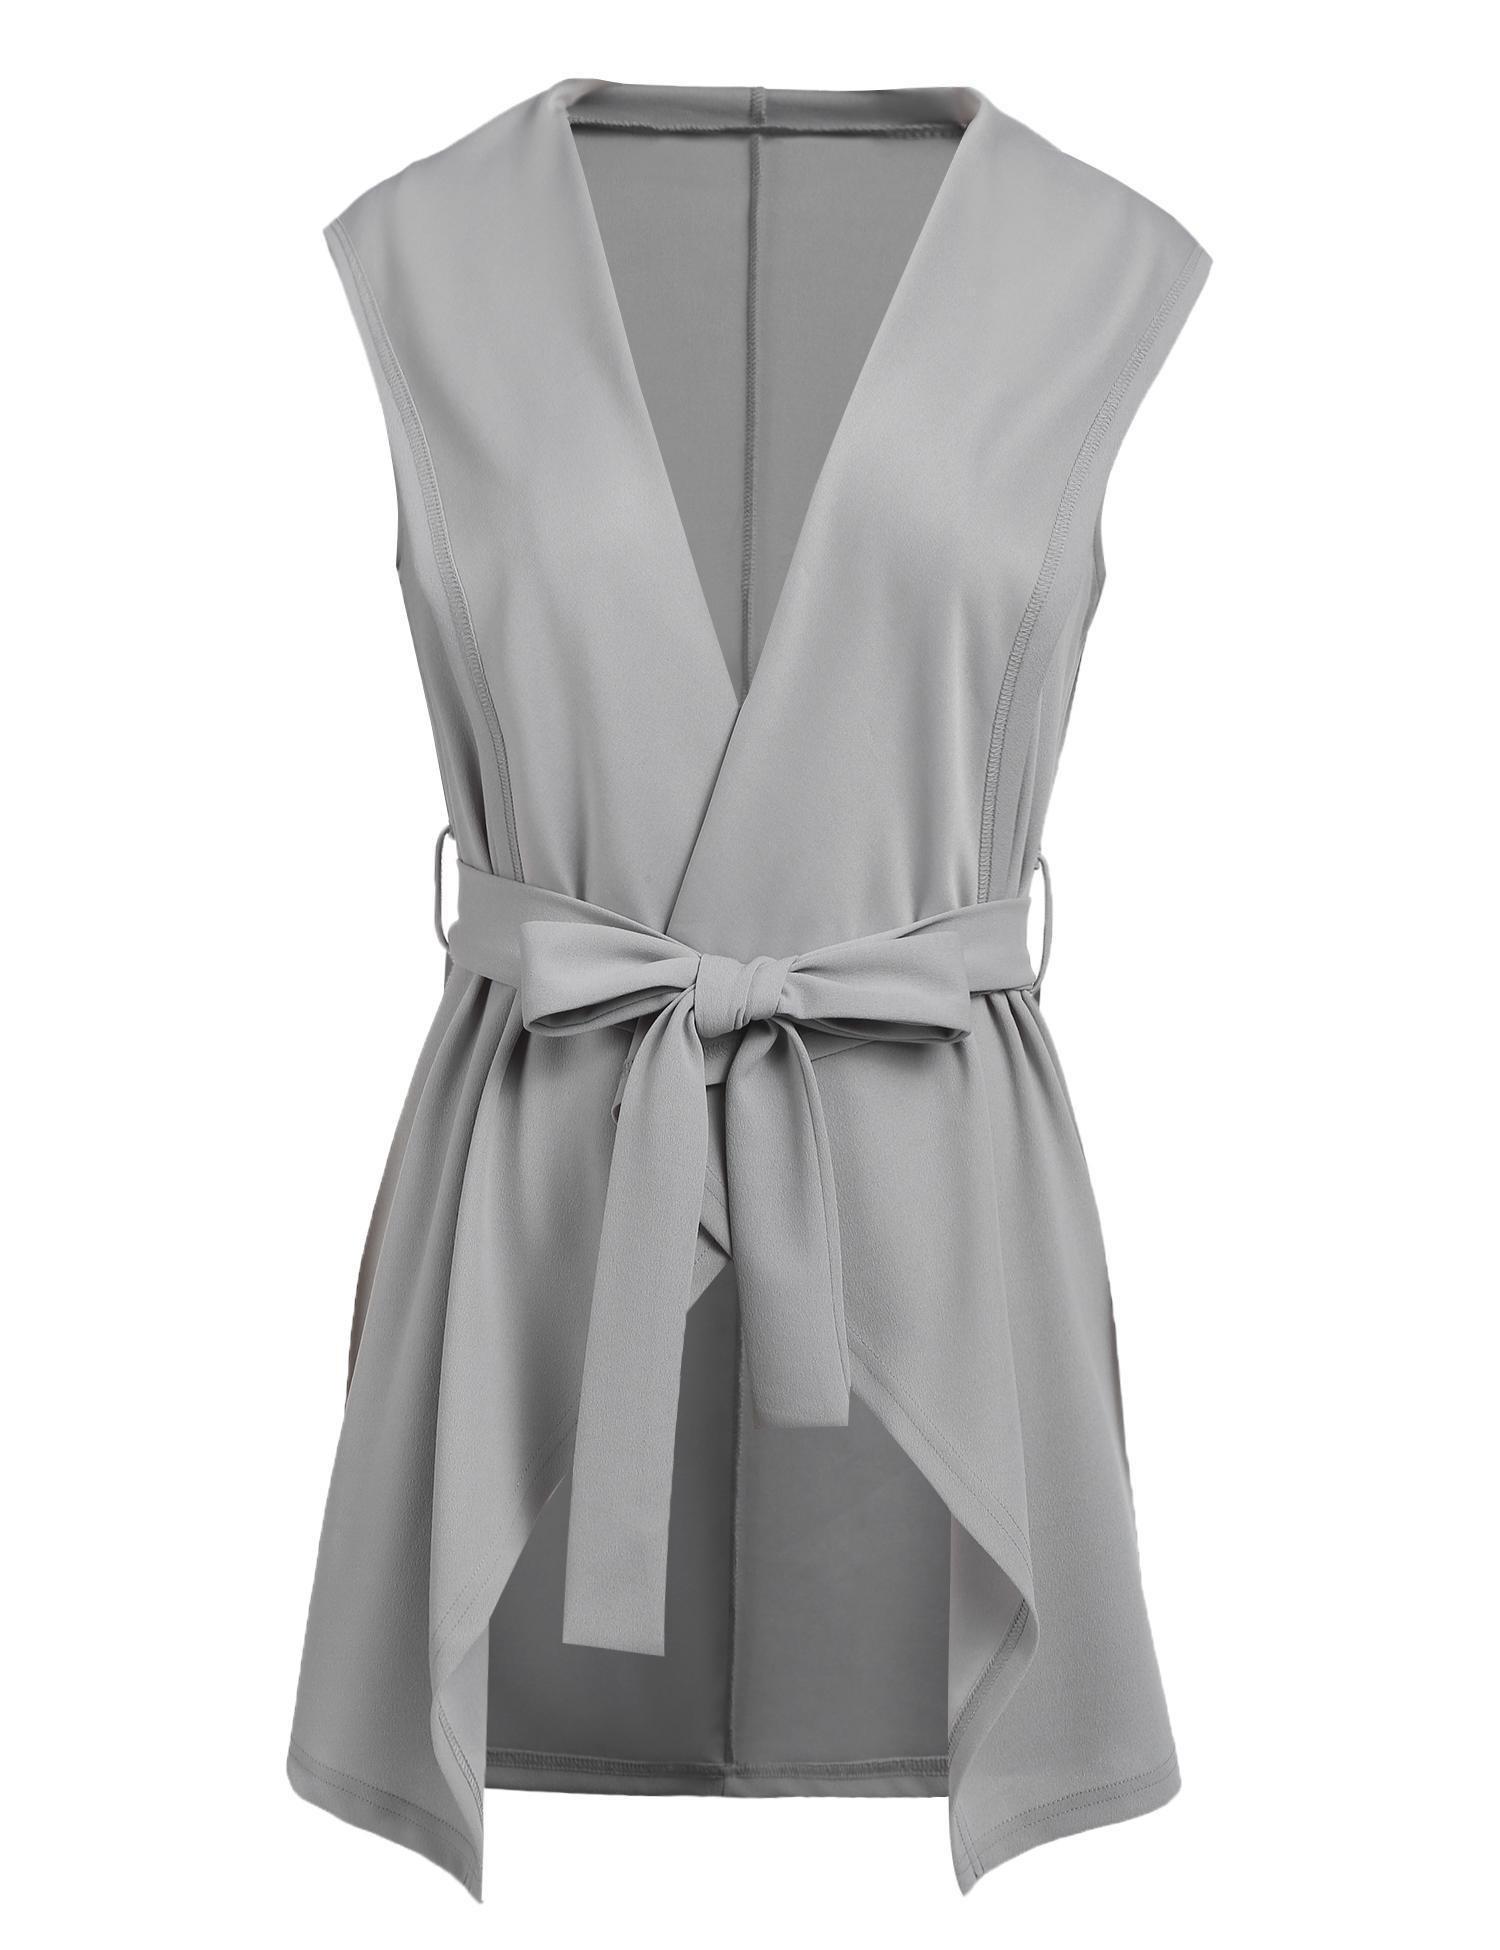 Grabsa Women's Casual Lapel Open Front Sleeveless Vest Cardigan Jacket with Belt